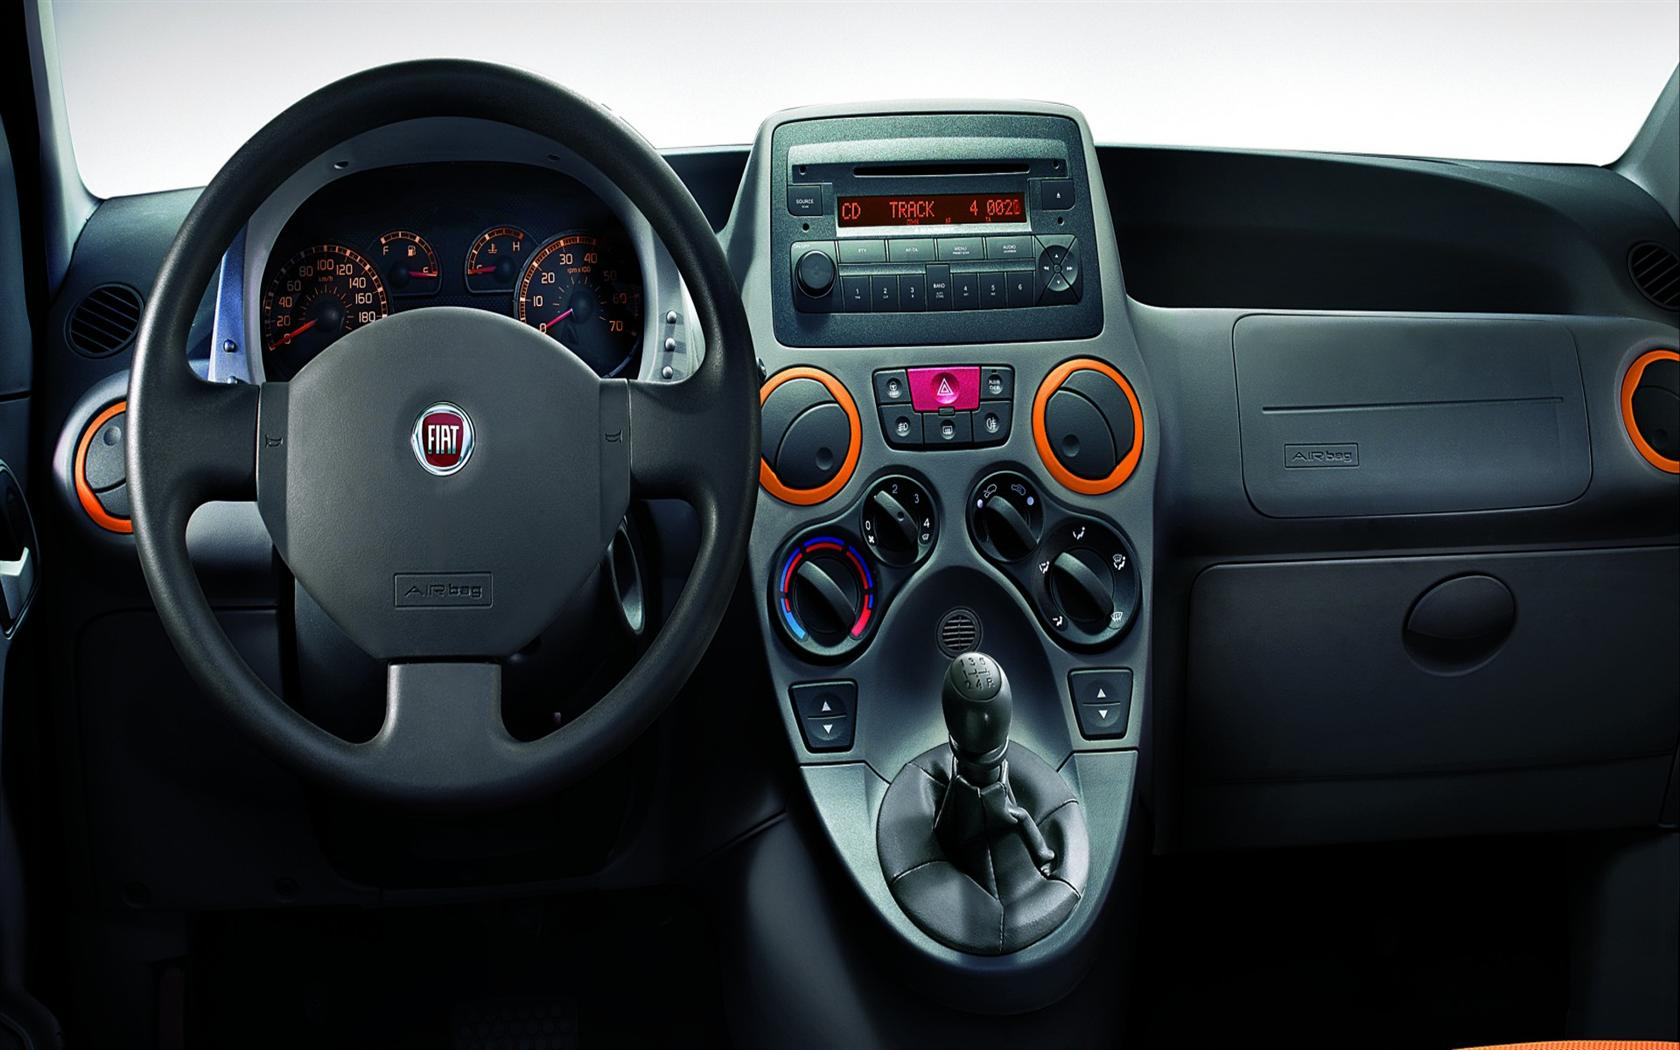 2009 Fiat Panda Image. https://www.conceptcarz.com/images/Fiat/Fiat ...